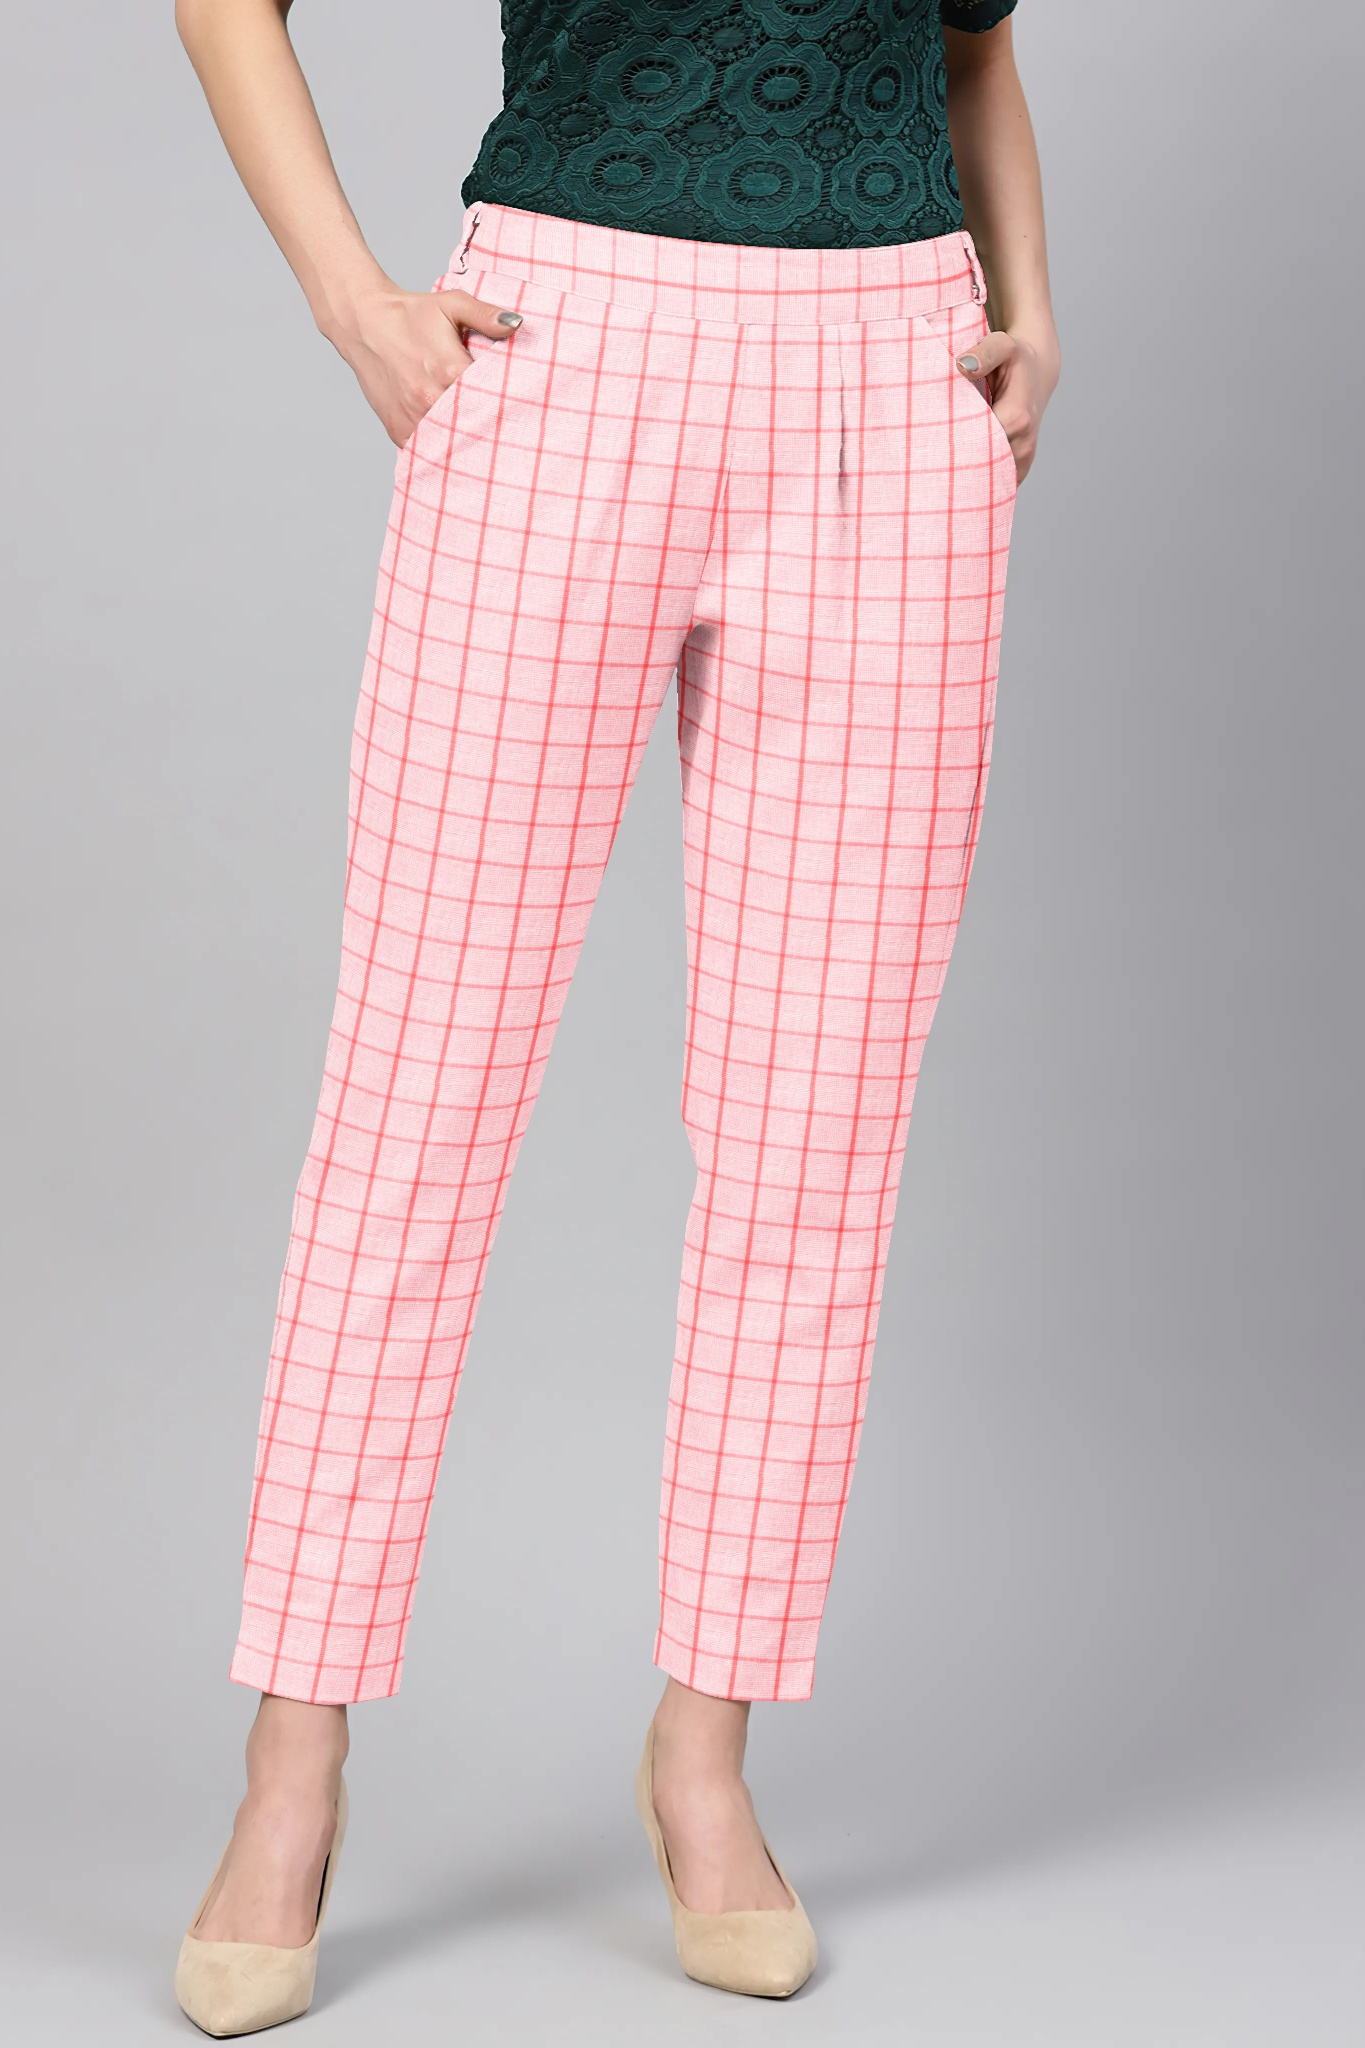 /home/customer/www/fabartcraft.com/public_html/uploadshttps://www.shopolics.com/uploads/images/medium/Pink-Black-Cotton-Check-Regular-Fit-Solid-Trouser-36093.jpg